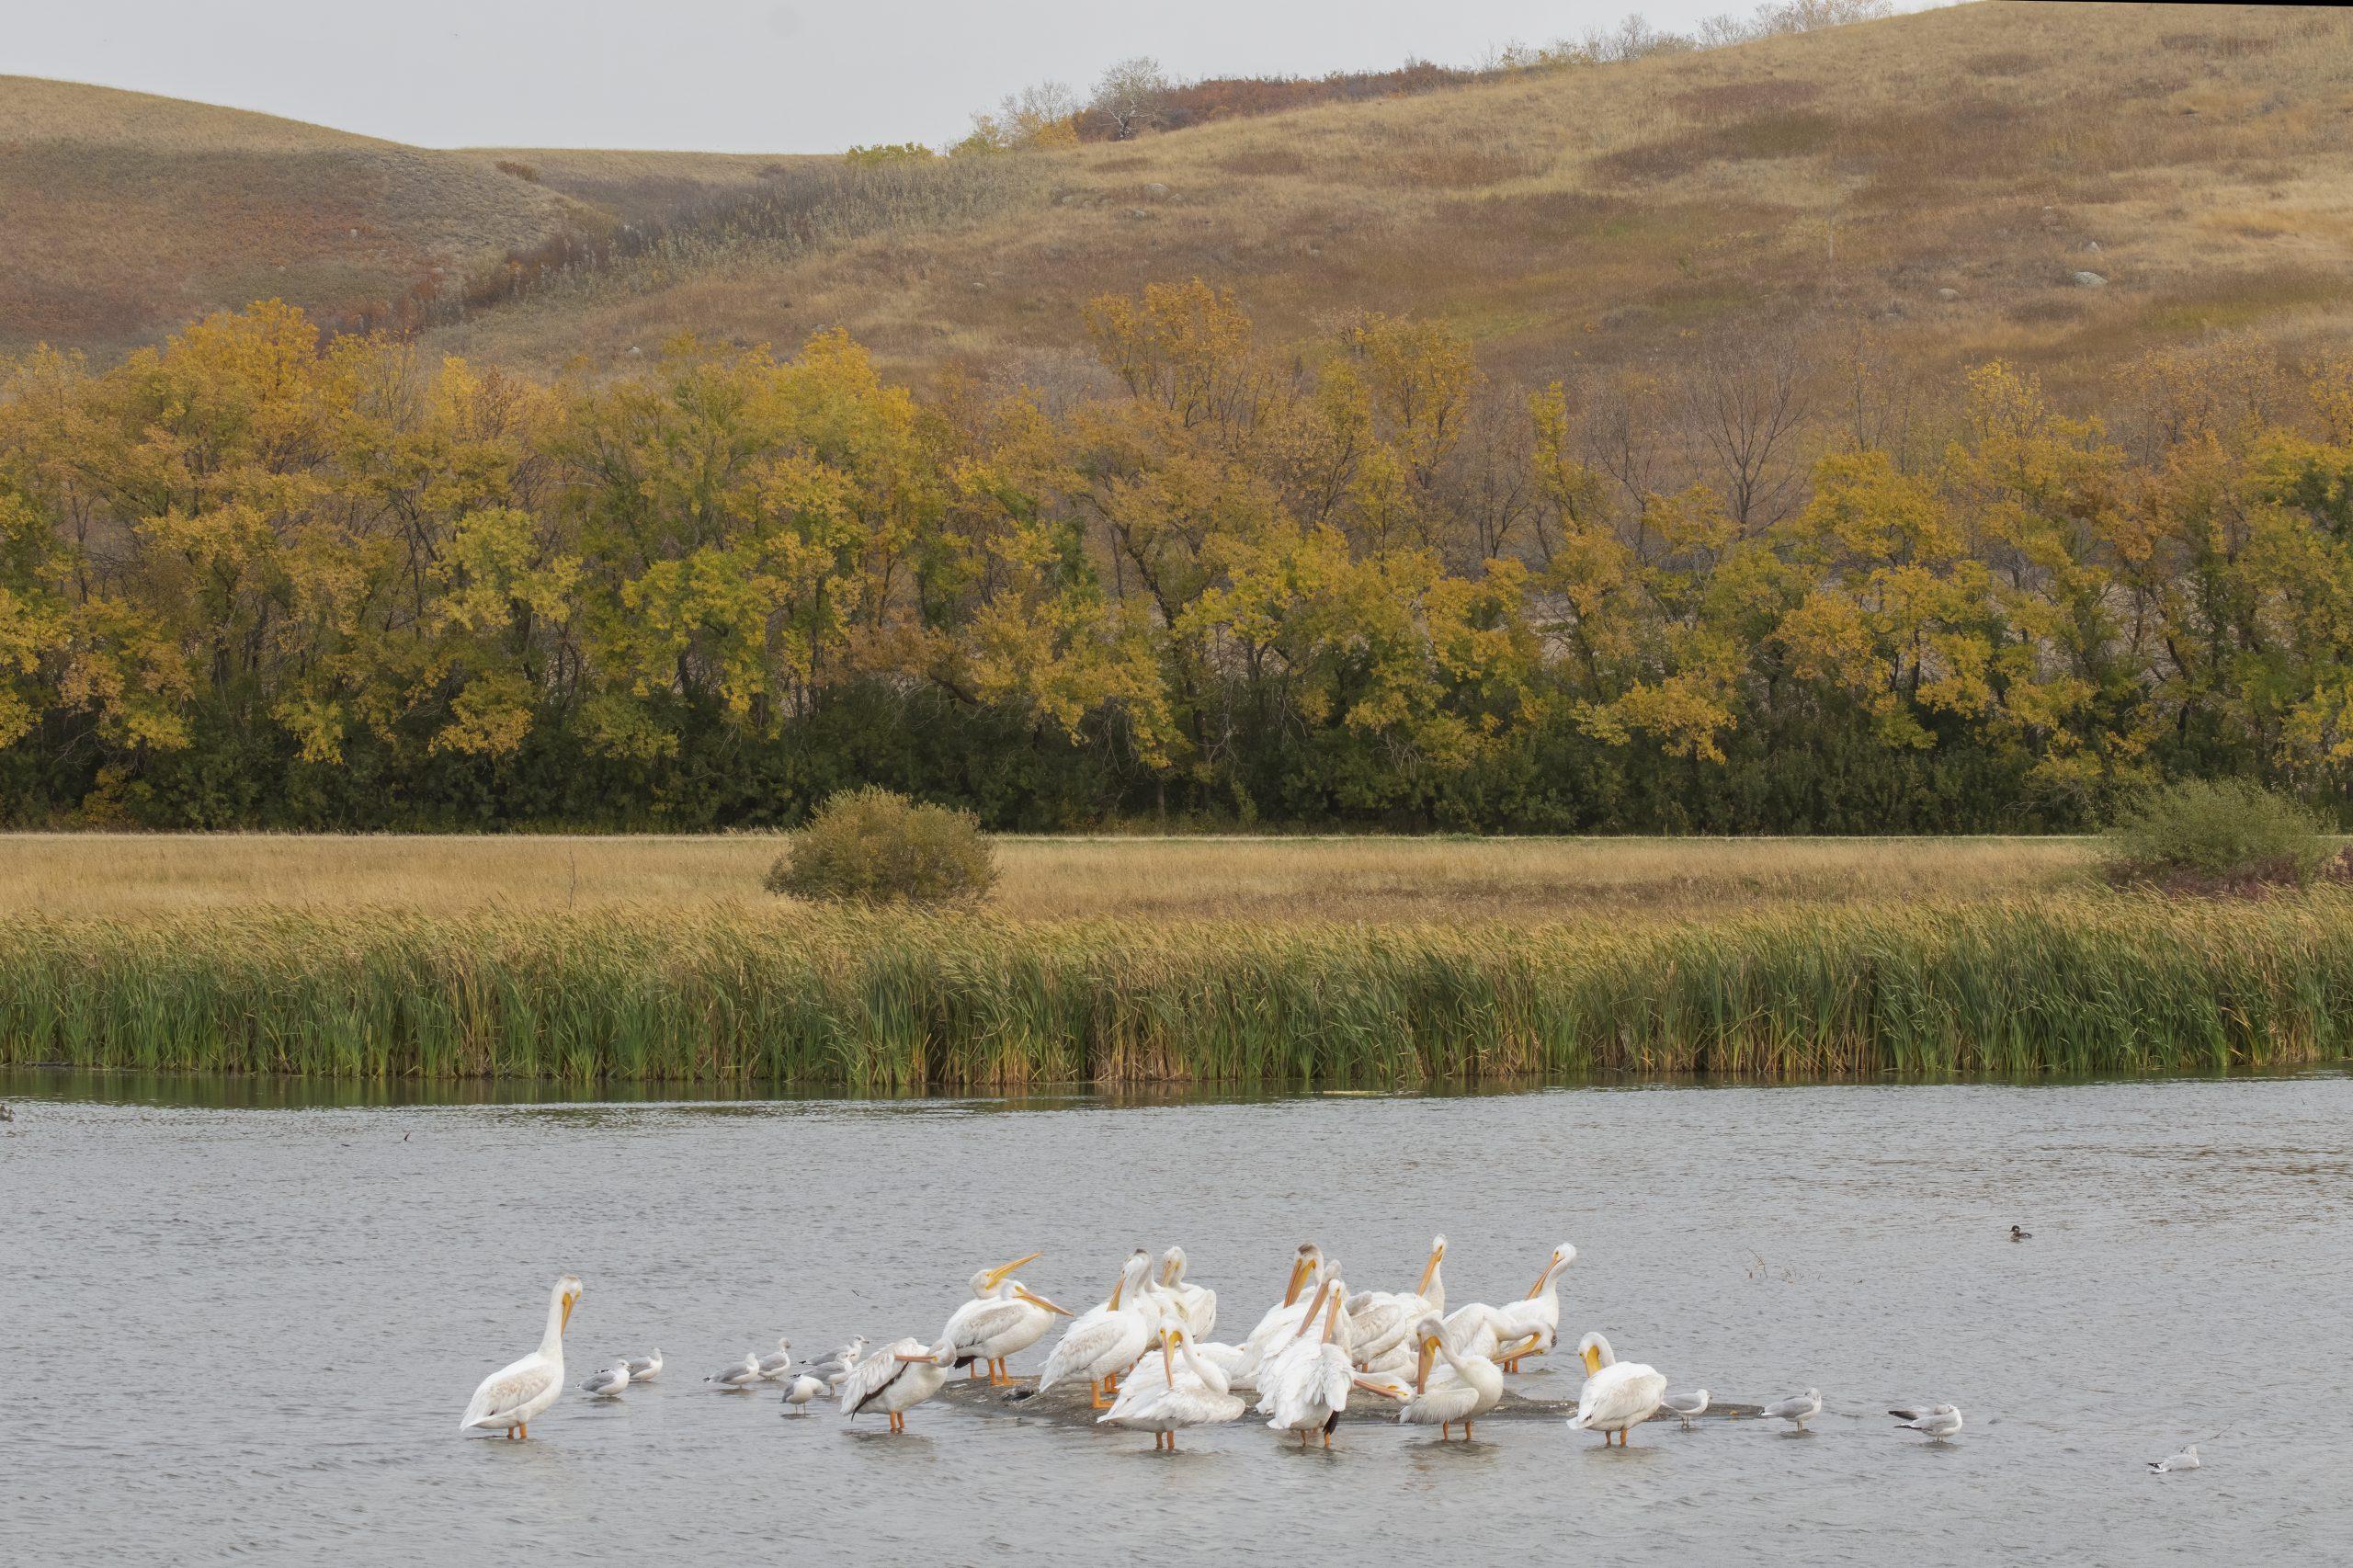 American White Pelicans, Ring-billed Gulls, and Bufflehead in a Saskatchewan Wetland